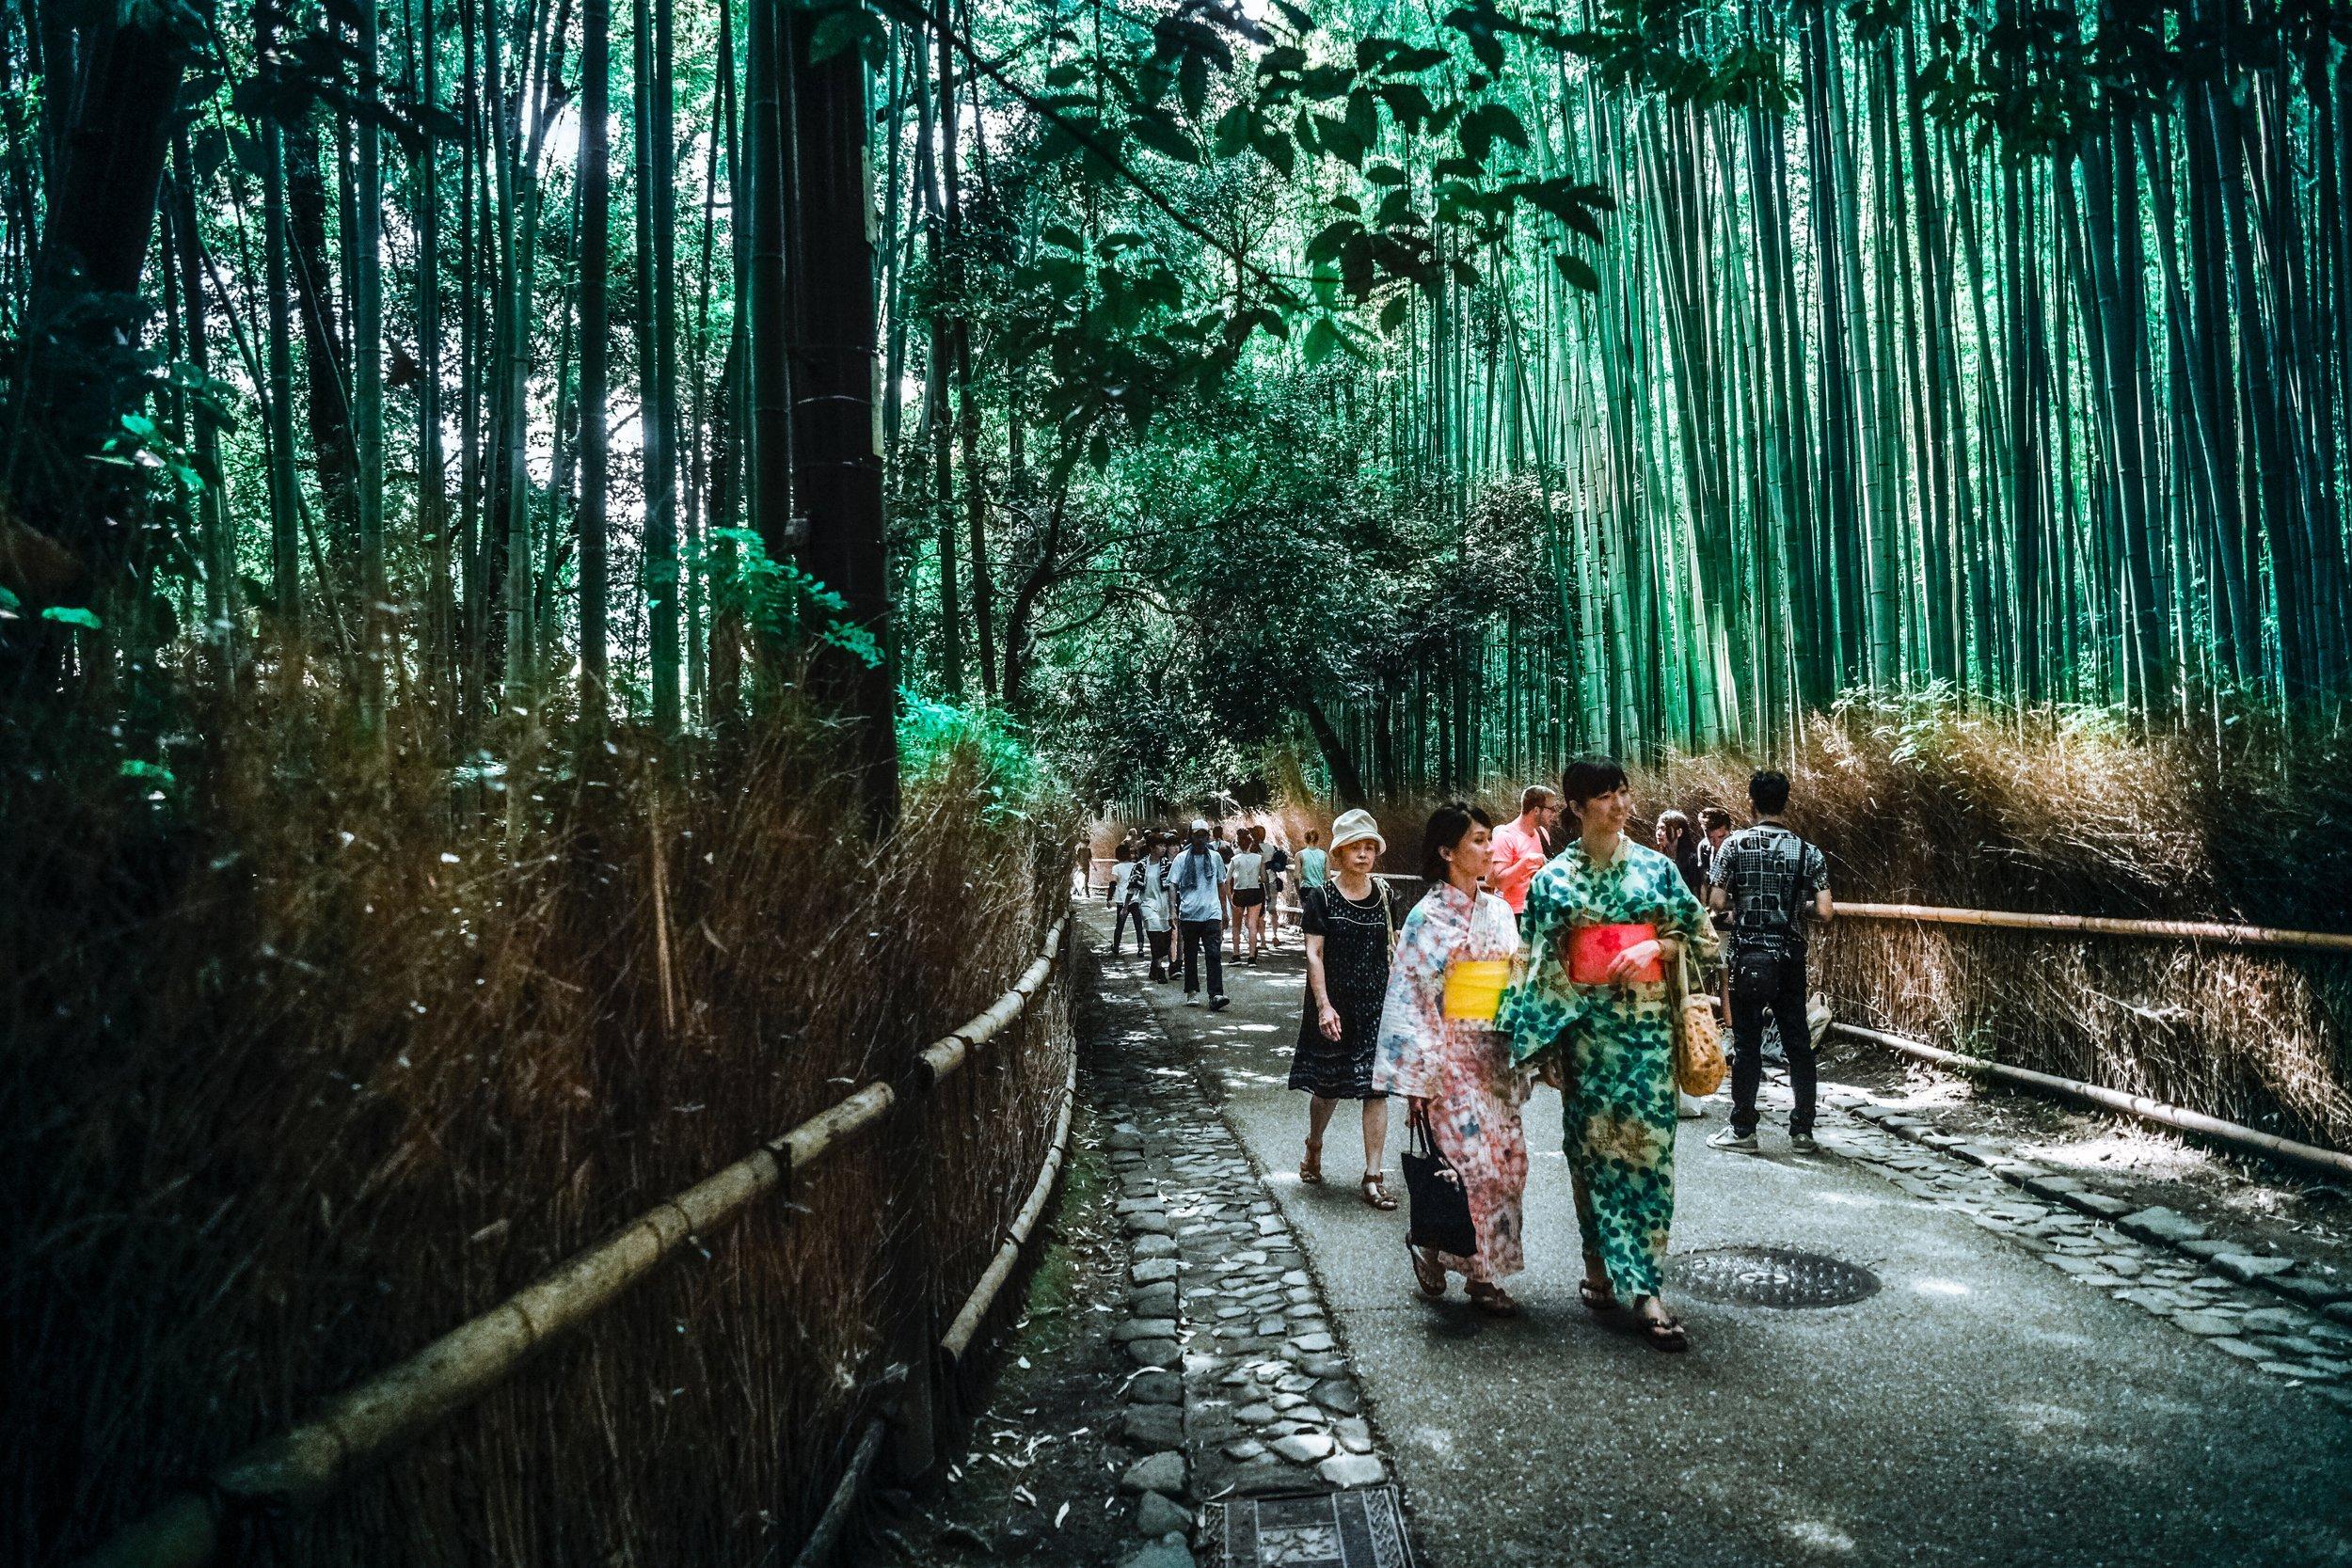 bamboo-trees-bridge-city-115603.jpg